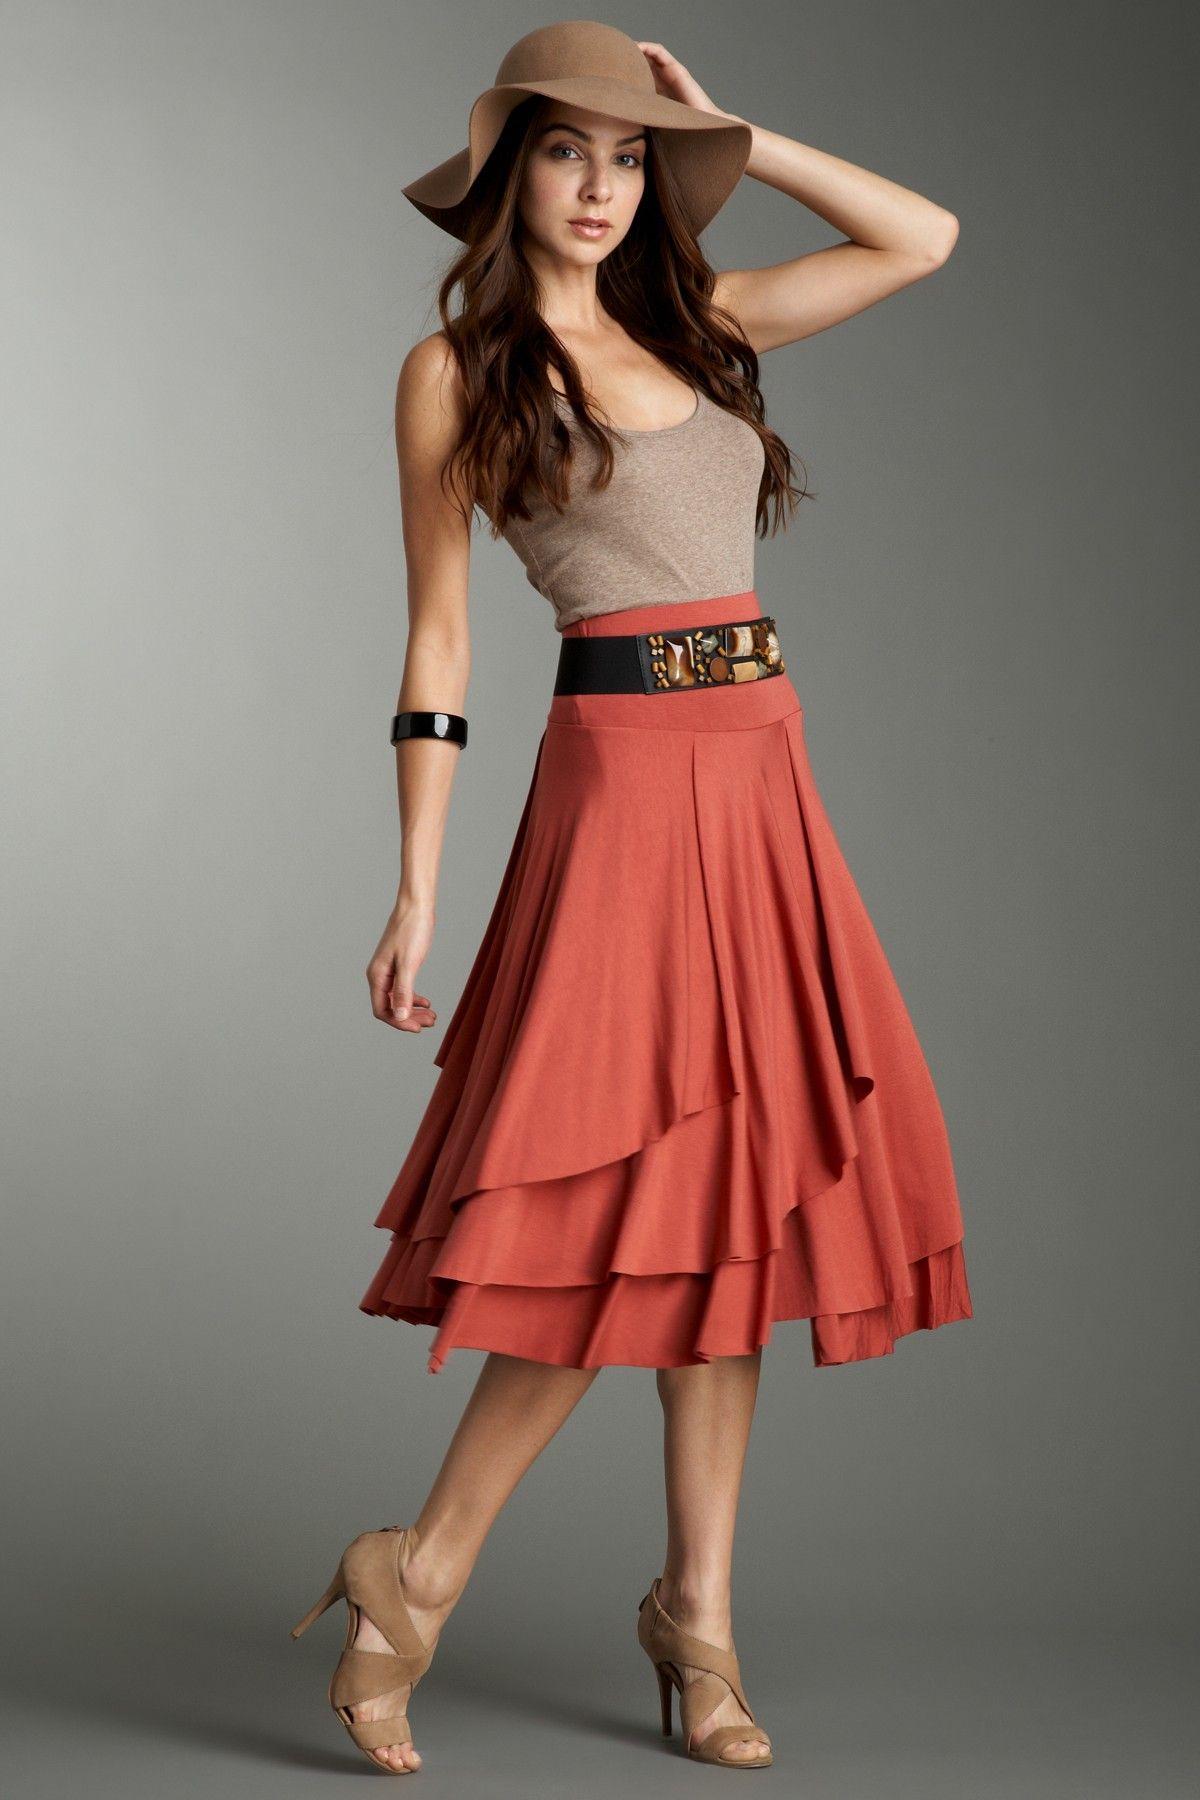 78271b1d5cbe3 Cute Outfit- Rachel Pally Cascade Convertible Dress Skirt Wish I had the  legs to pull